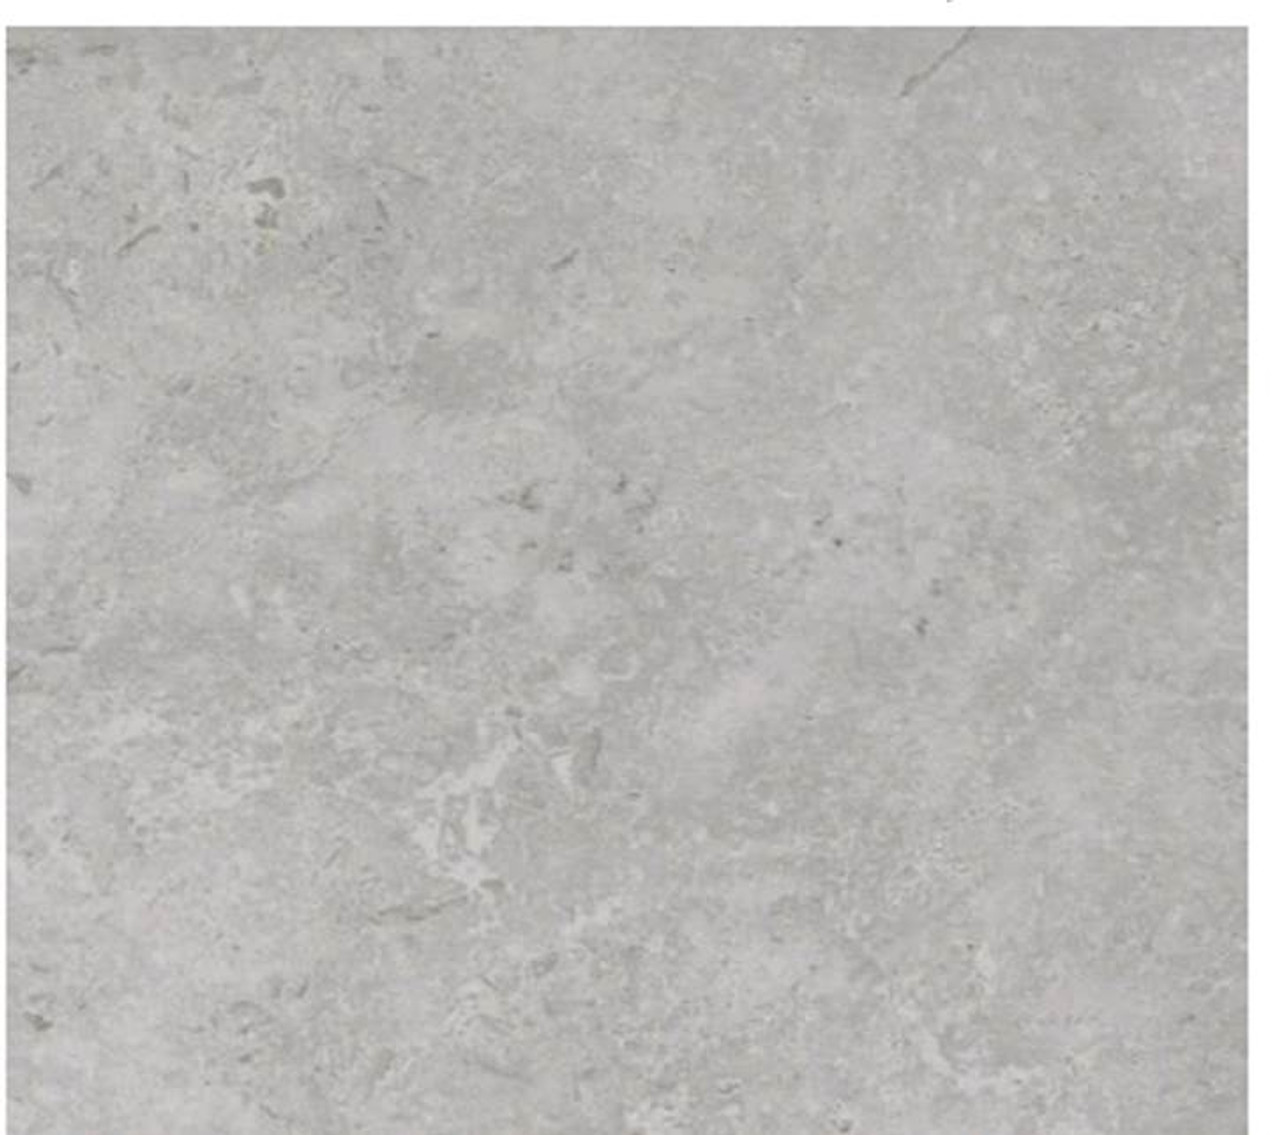 westmont quarry 12x12 porcelain tile 2nd quality 16 sf box